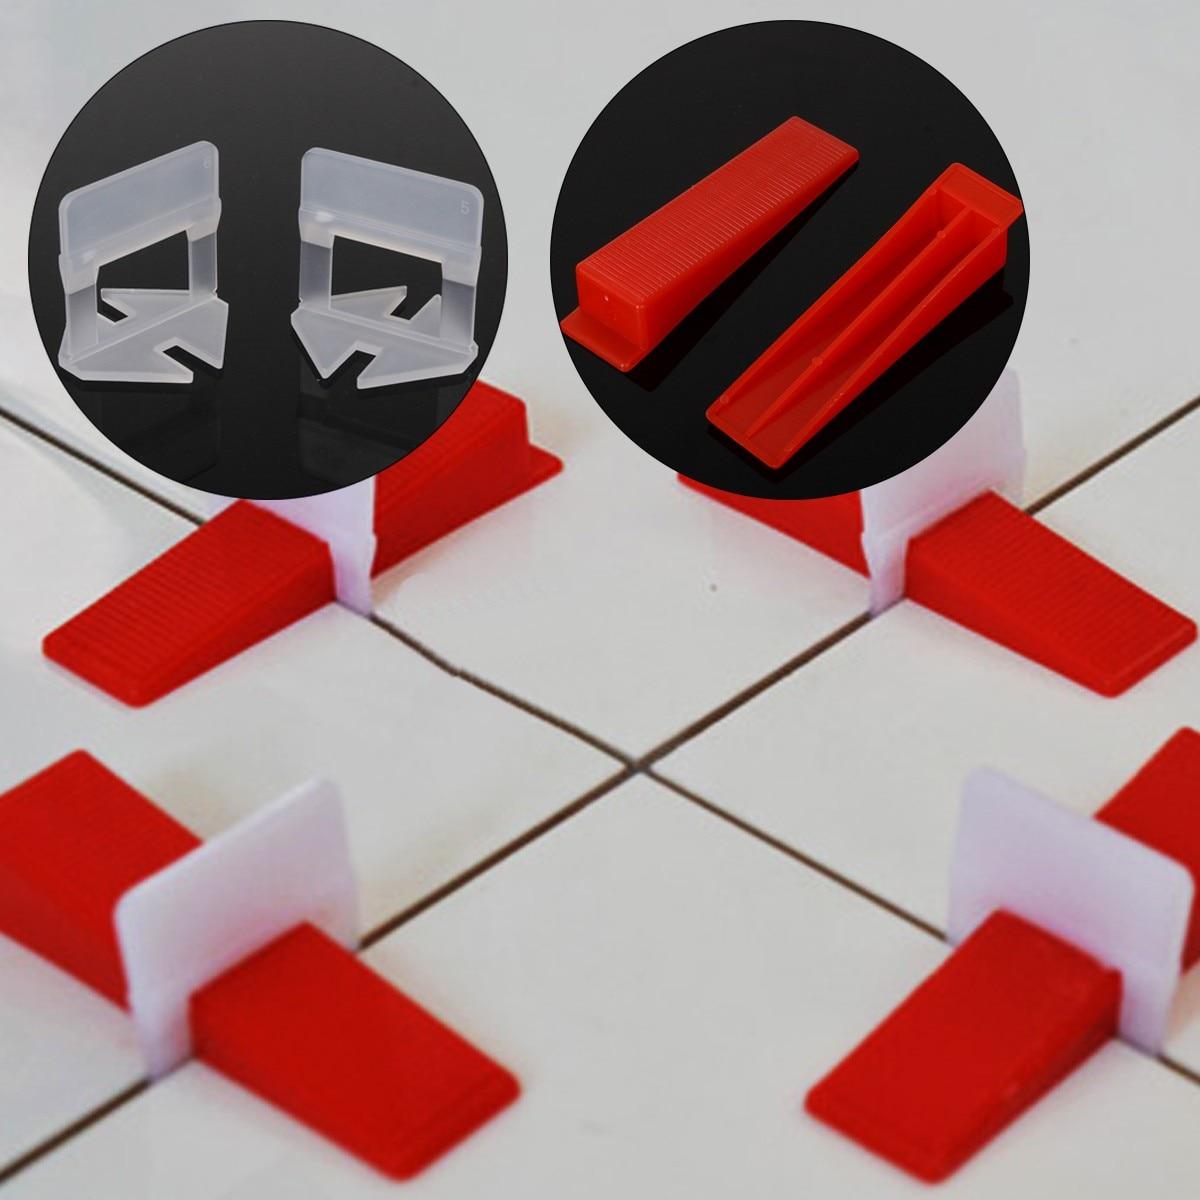 100Pcs Plastic Ceramic Tile Leveling System 50 Wedges 50 Clips Tiling Flooring Tools Wedges Clips Flooring Spacer